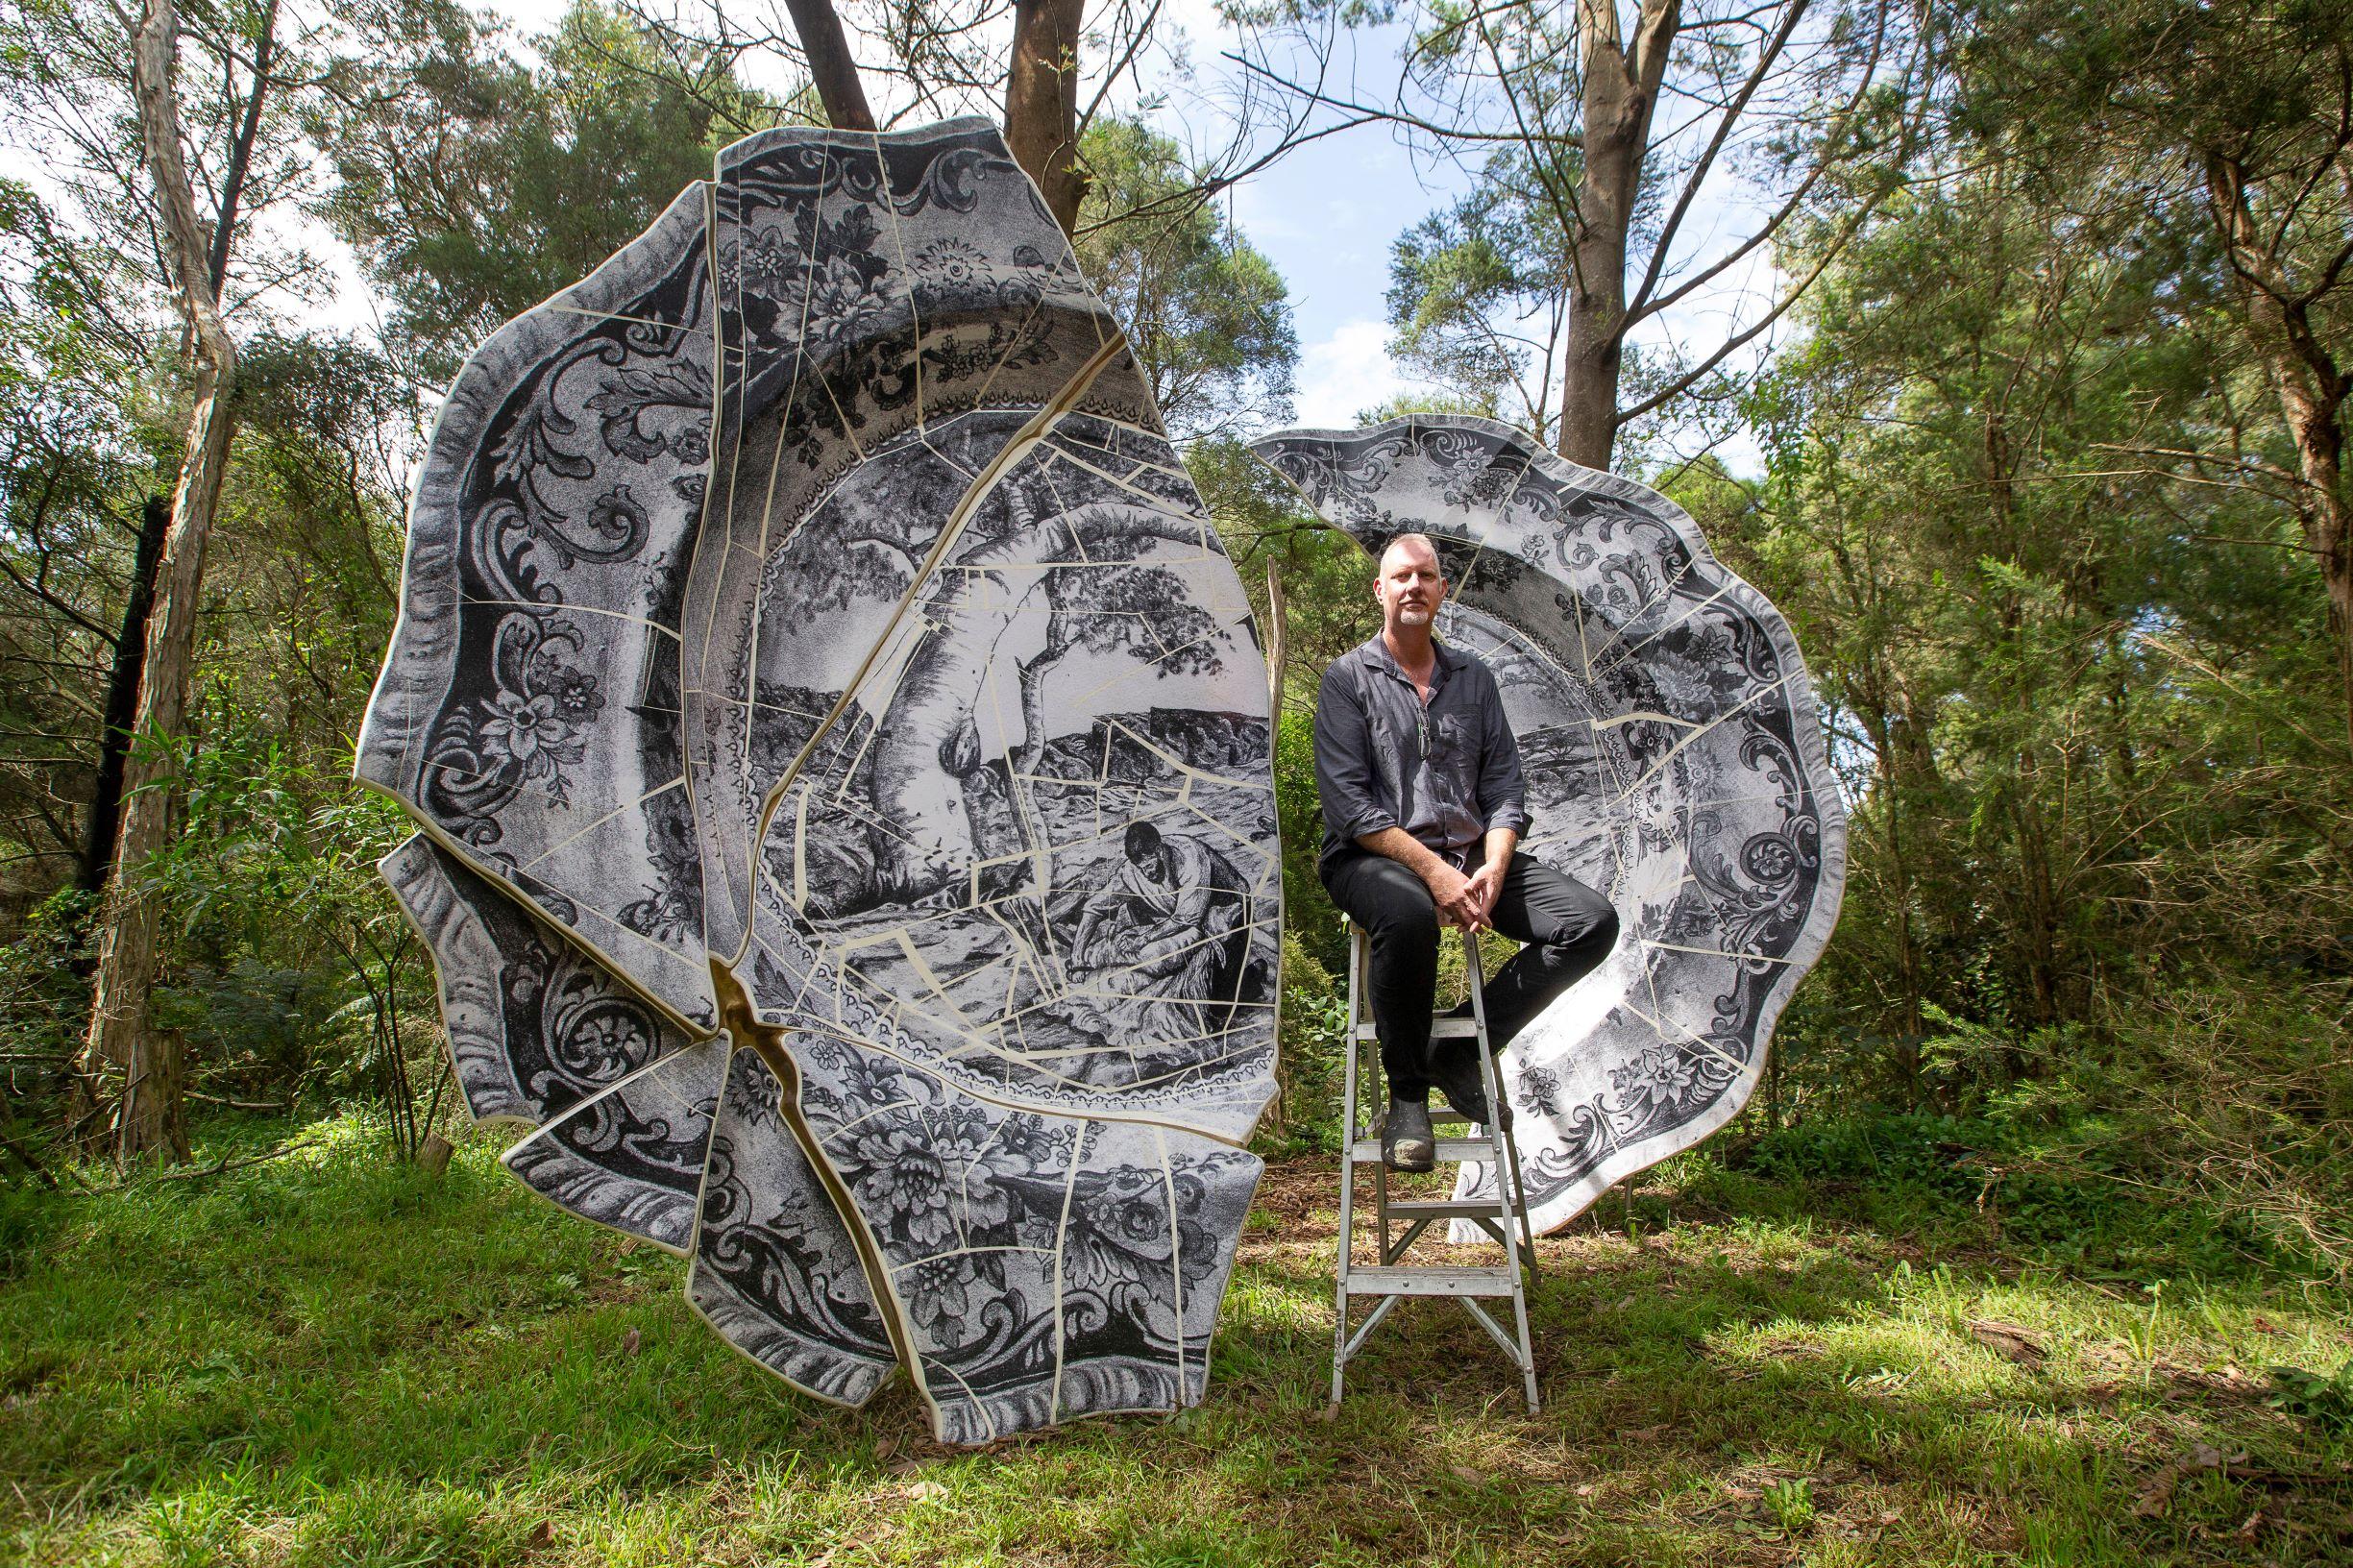 Robert Hague: Winner of the Montalto Sculpture Prize 2020